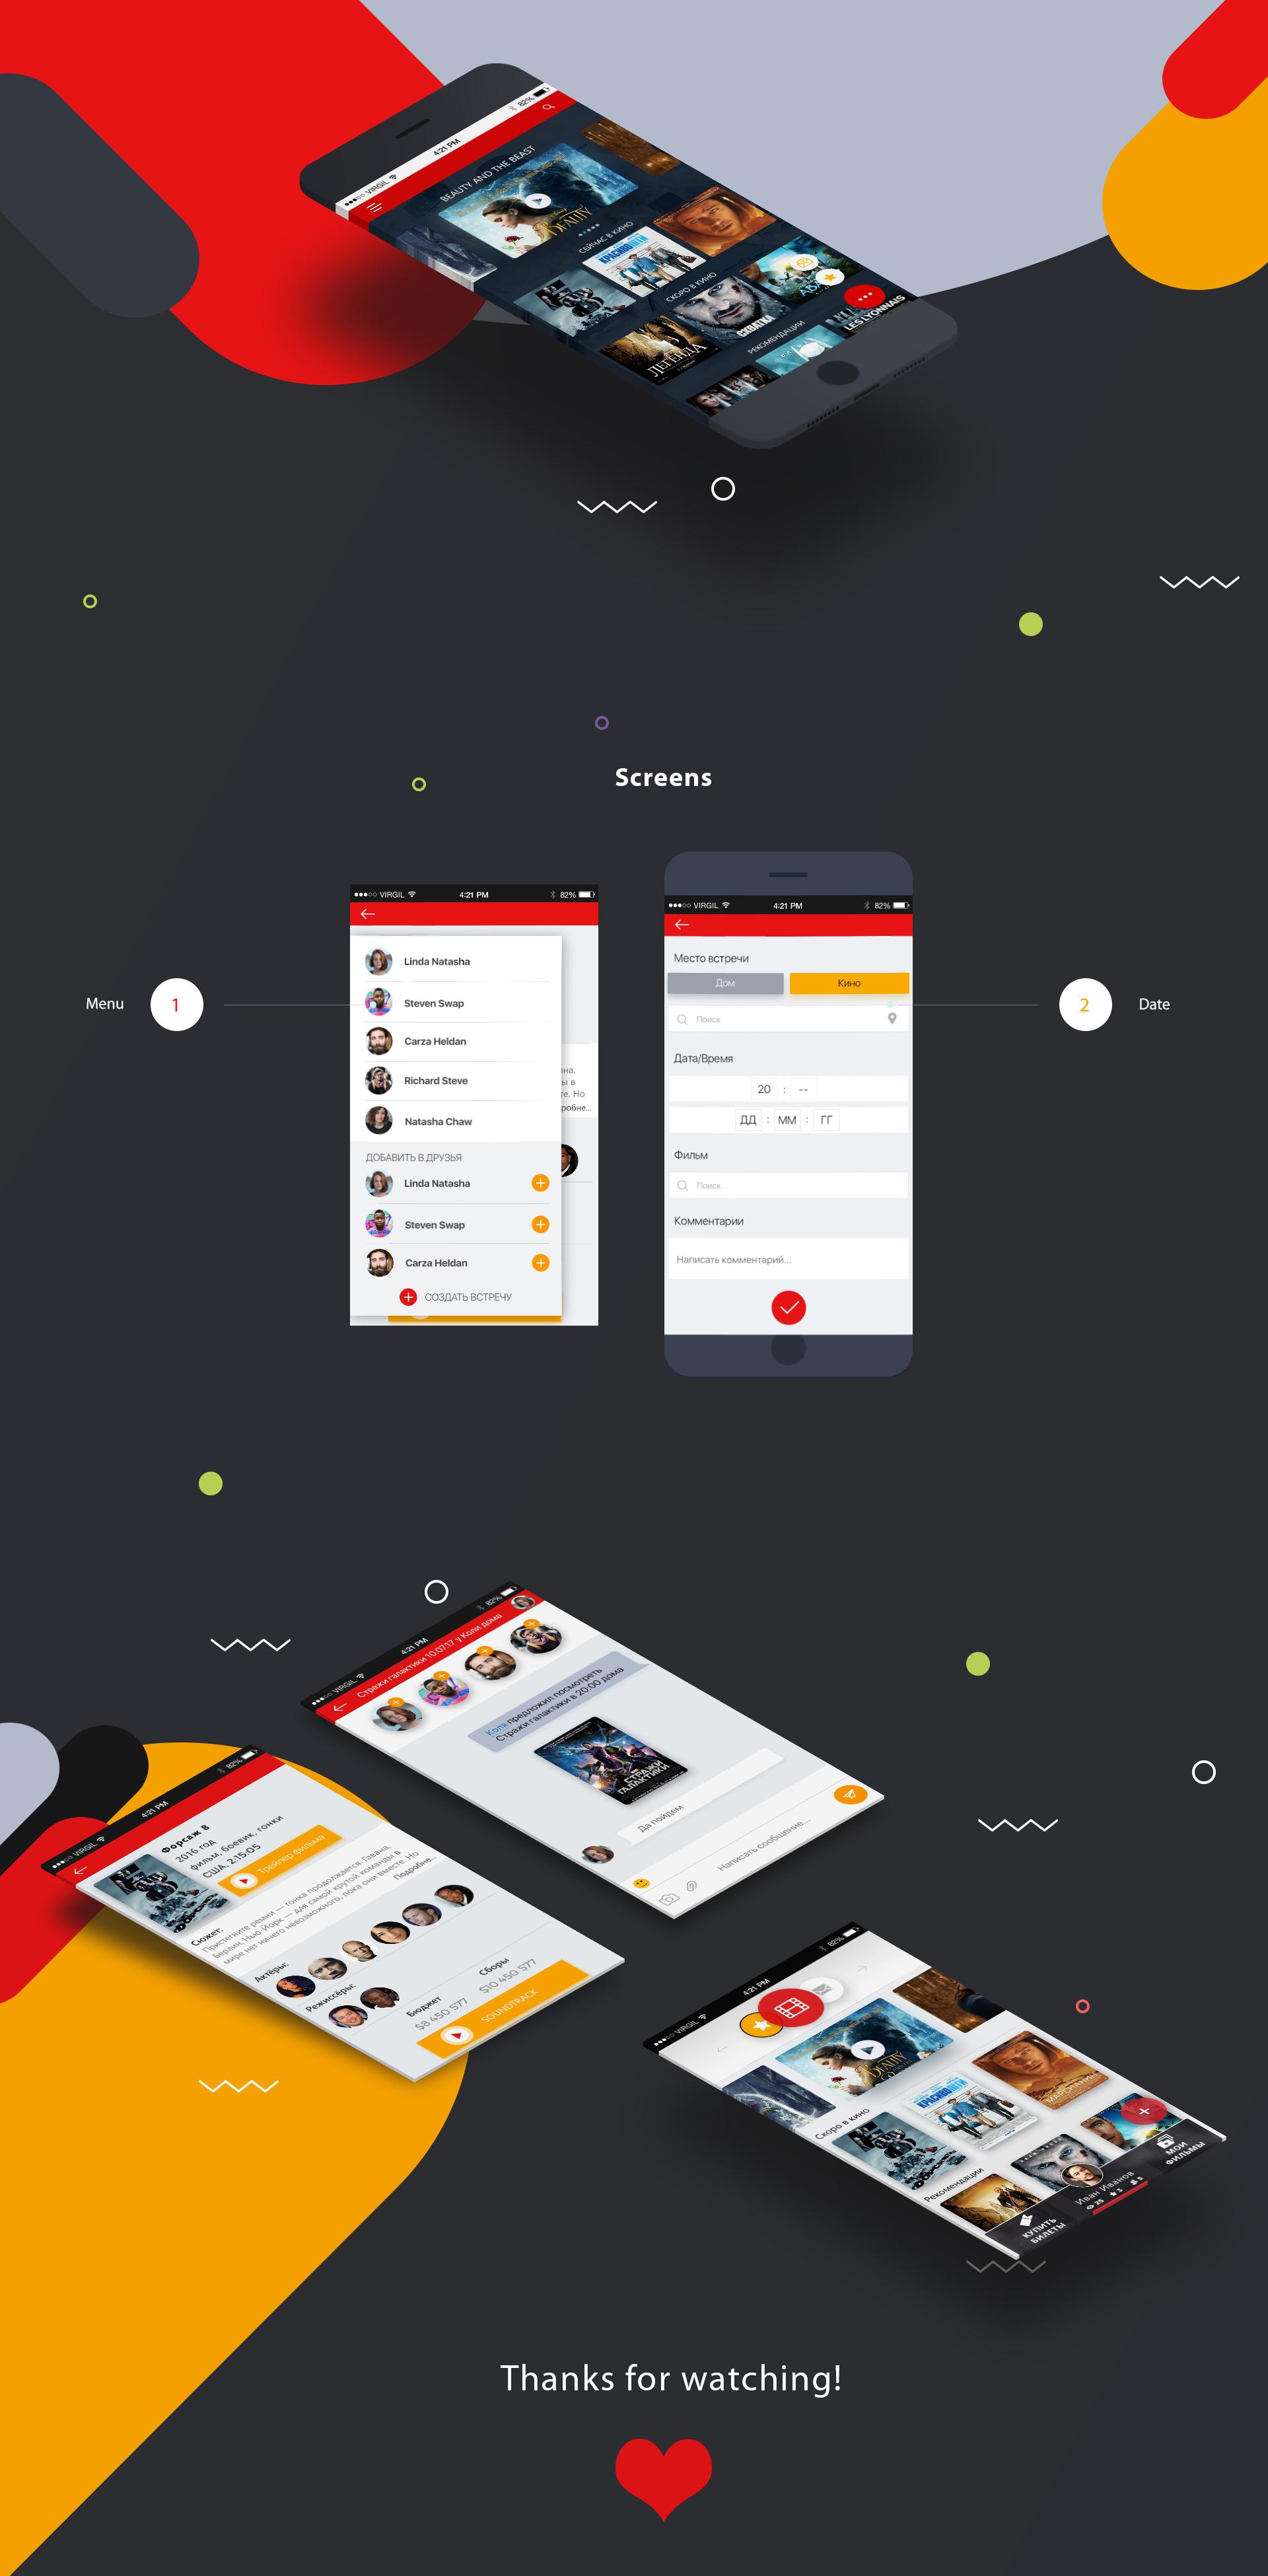 Mobile app CinemaD